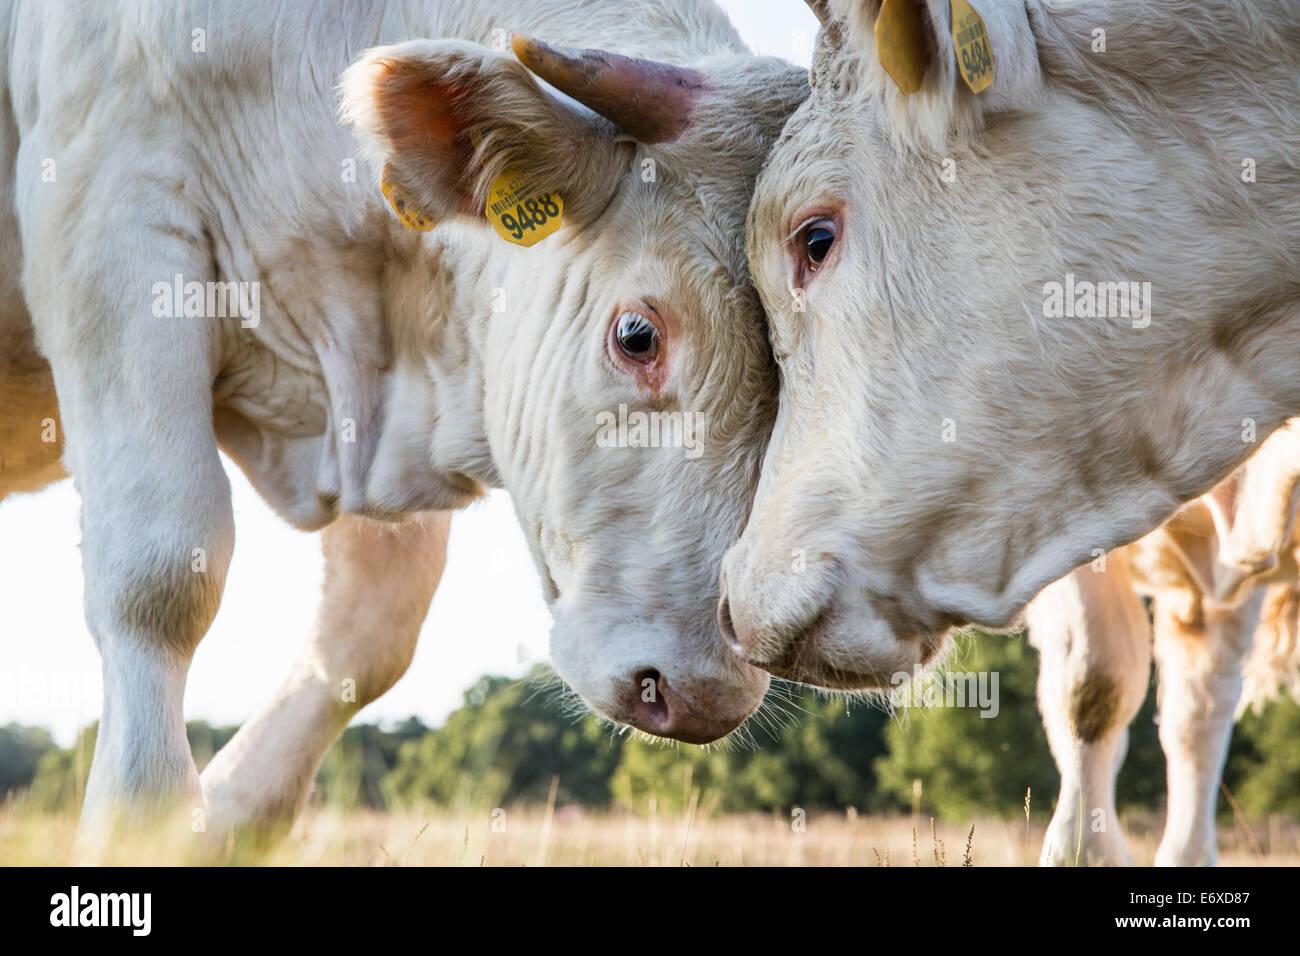 Paesi Bassi, Blaricum, brughiera o brughiera chiamato Tafelbergheide. Charolais bestiame. Giovani tori sfidandosi Immagini Stock